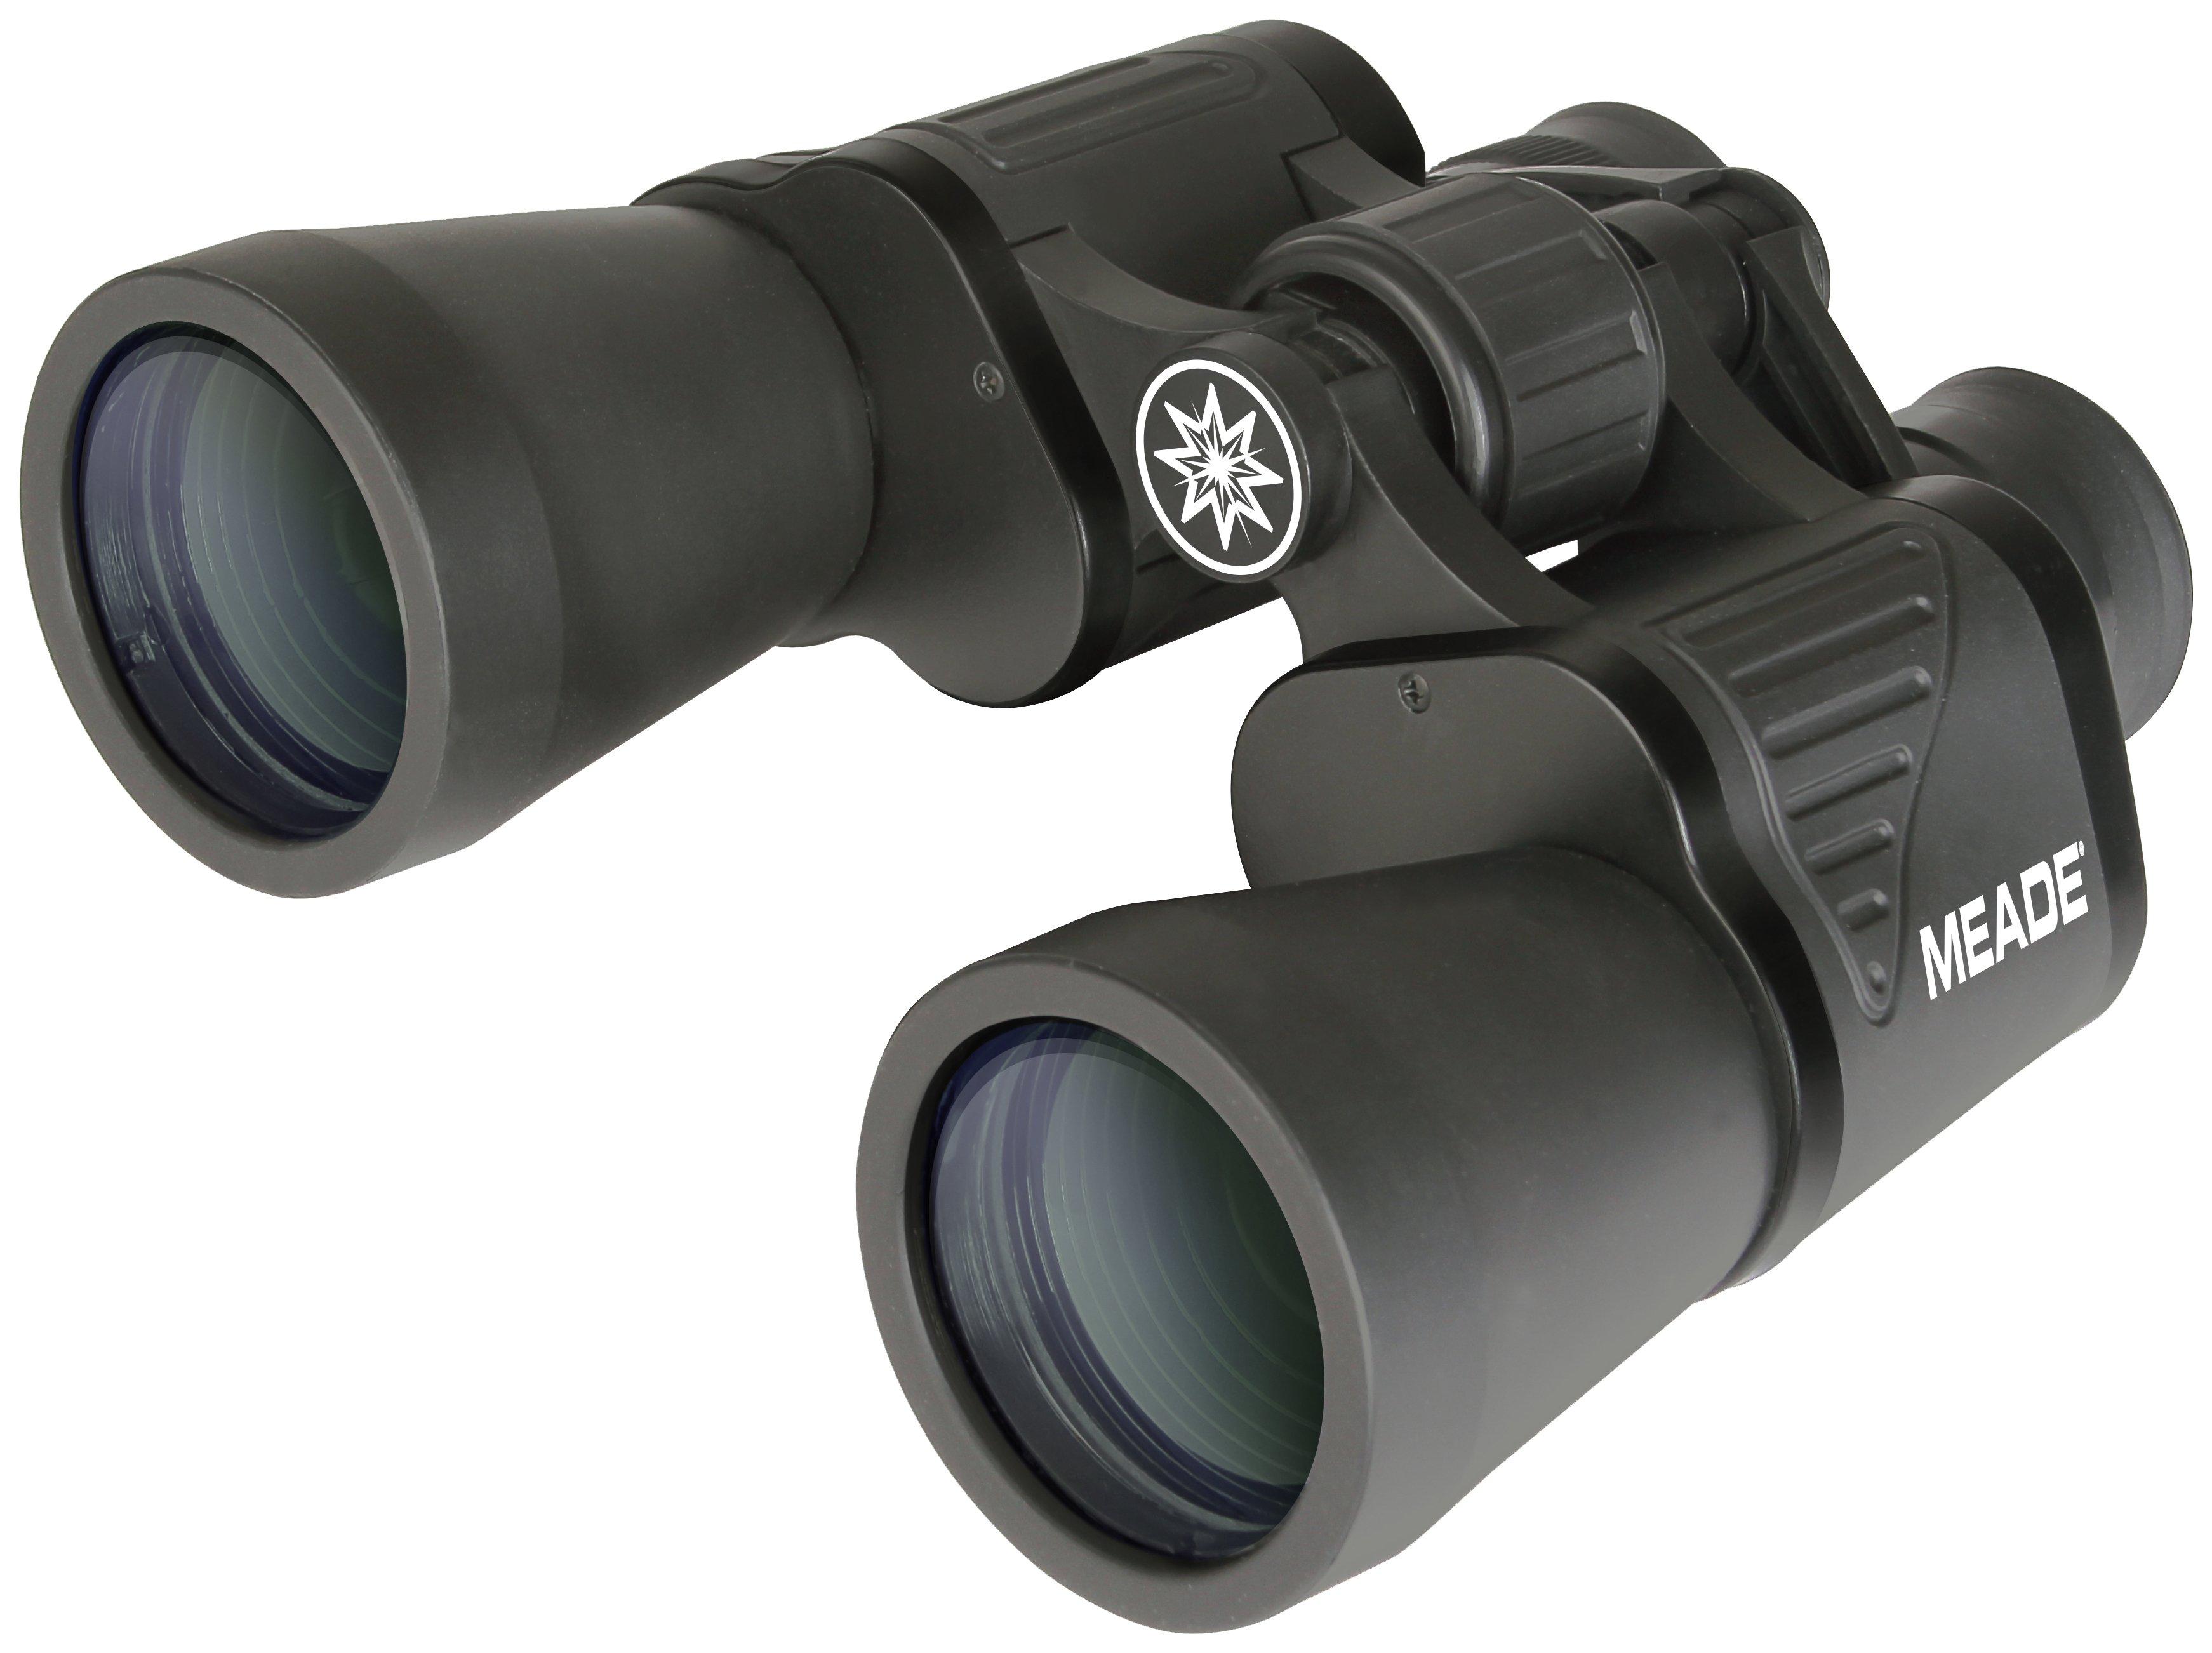 Meade - Travelview - Binoculars - 10x50